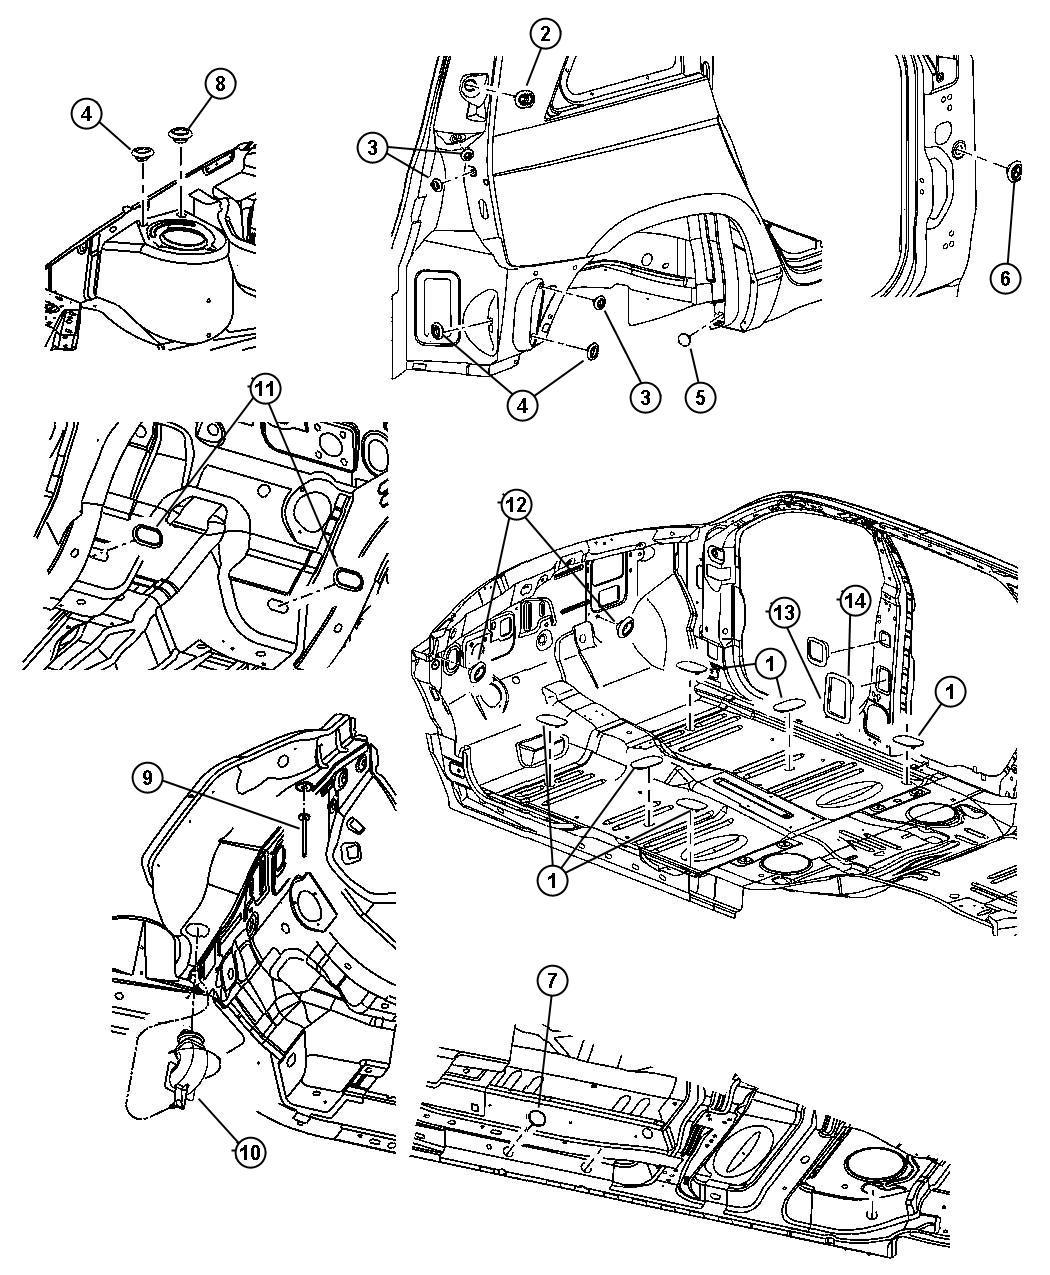 Chrysler Pacifica Awd 3 5l V6 24v Mpi 4 Spd Automatic Plugs